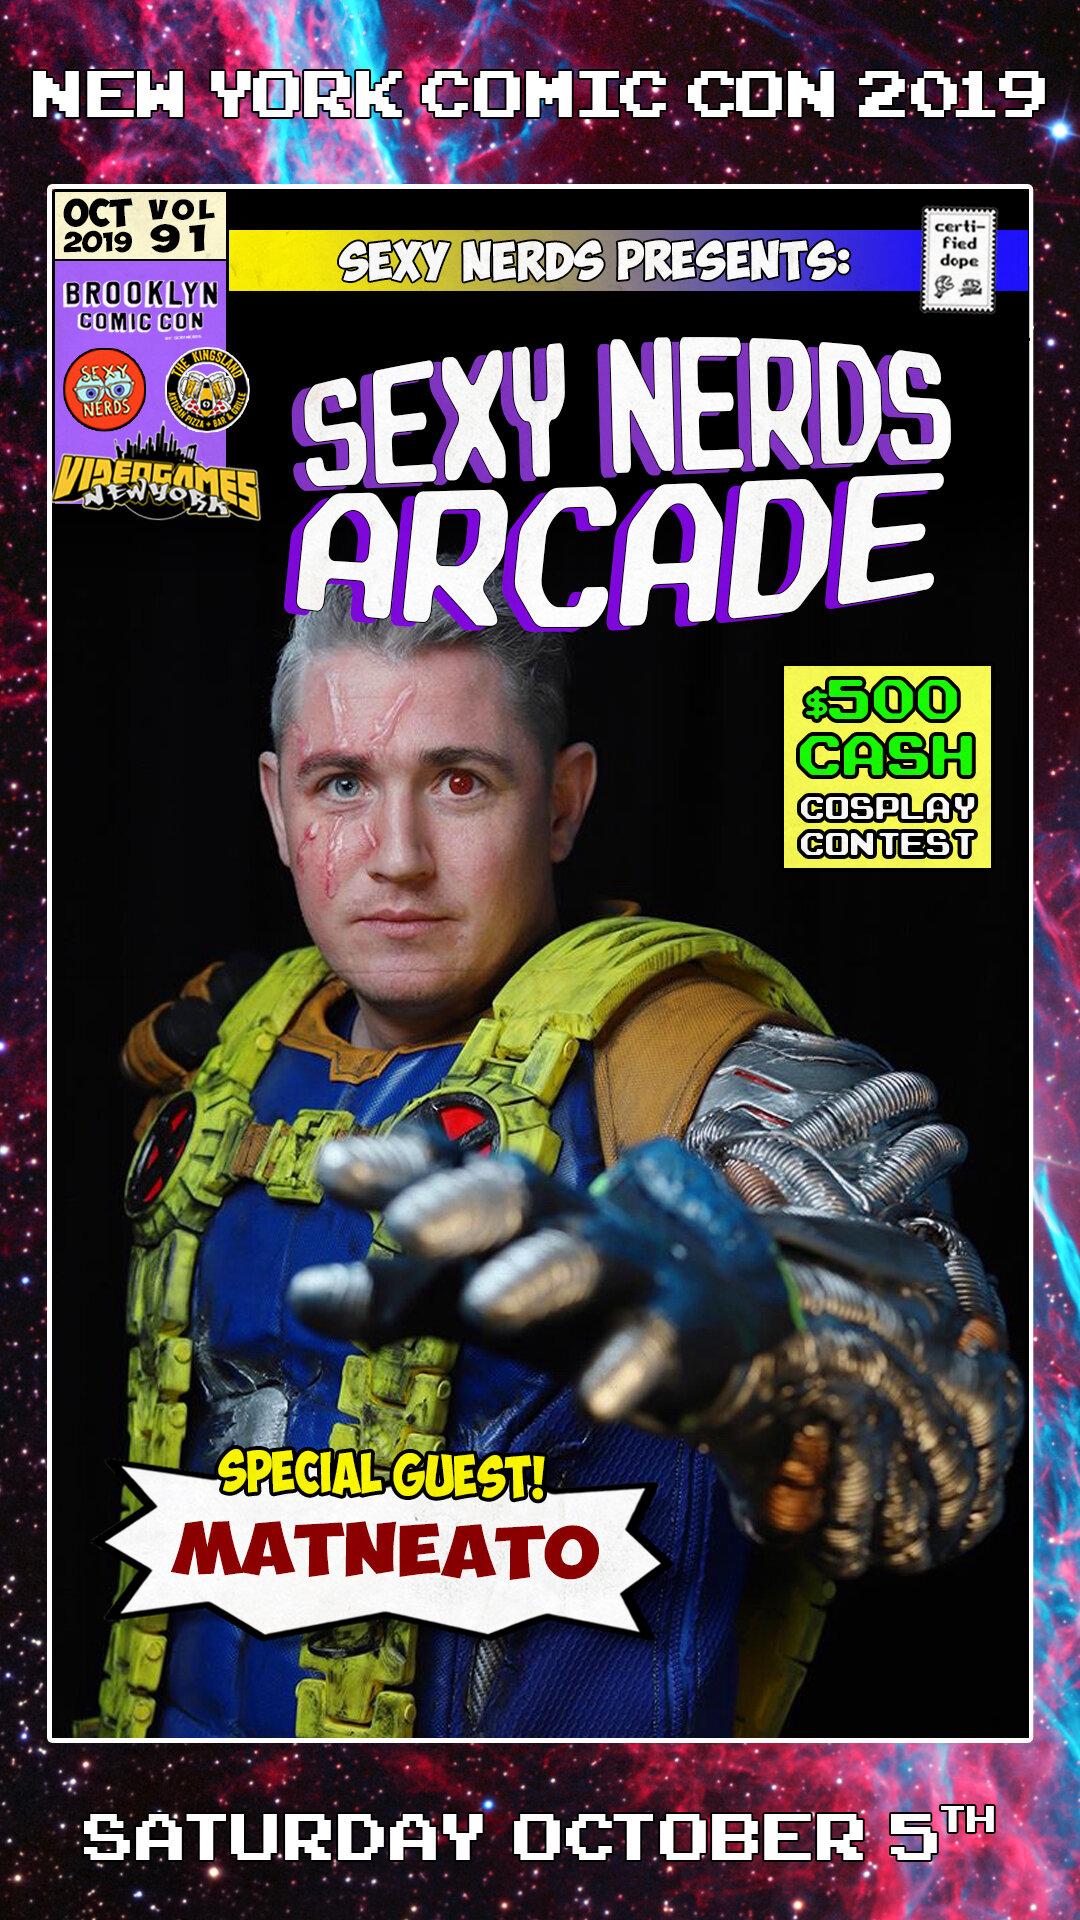 2019 NYCC Cosplay Comic Book matneato.jpg